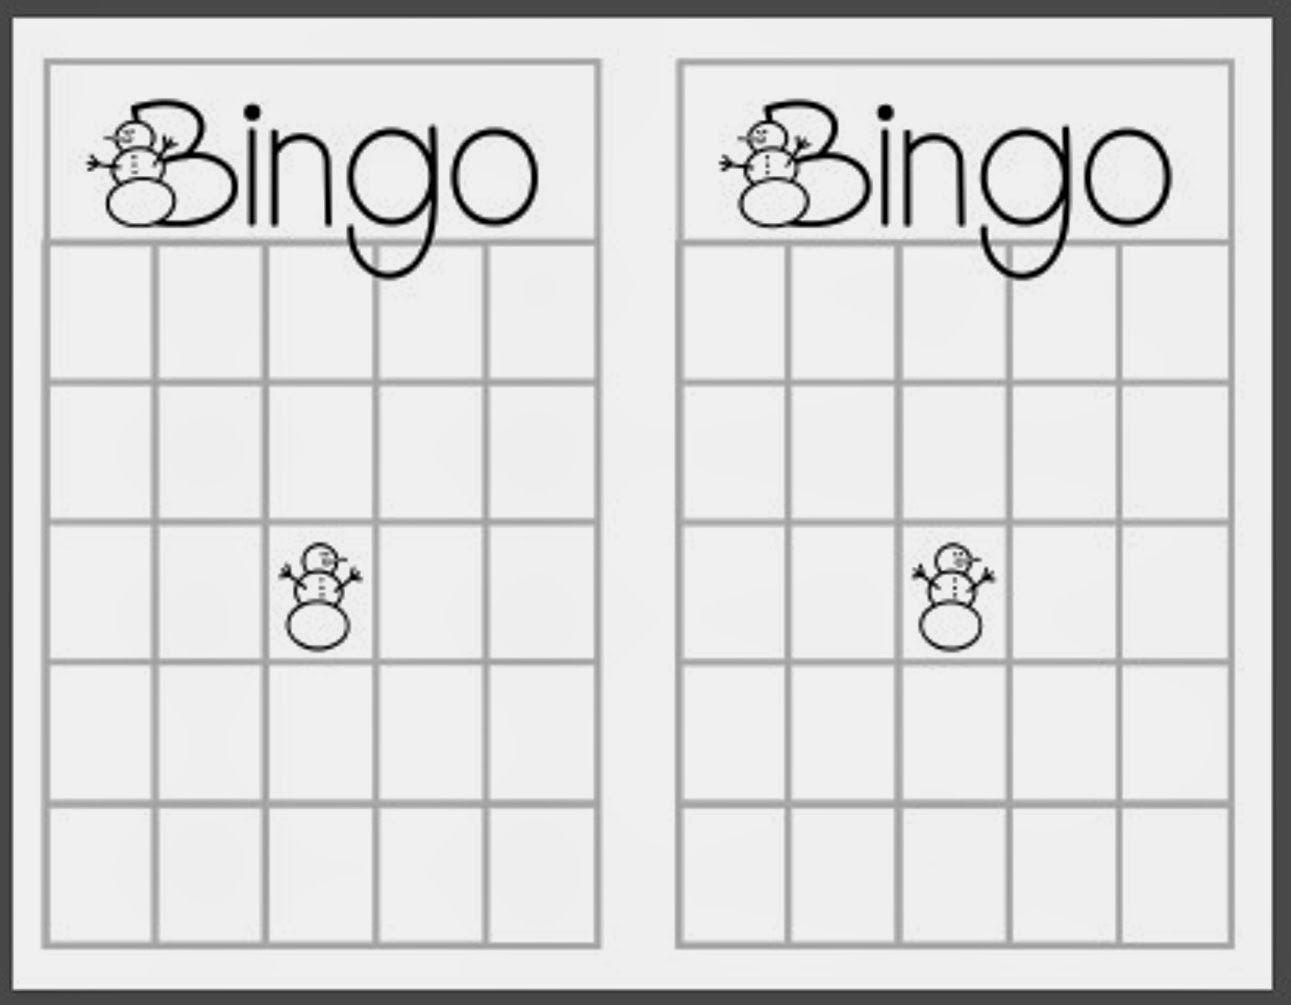 Christmas+Blank+Bingo+Card+Template | Bingo Card Template